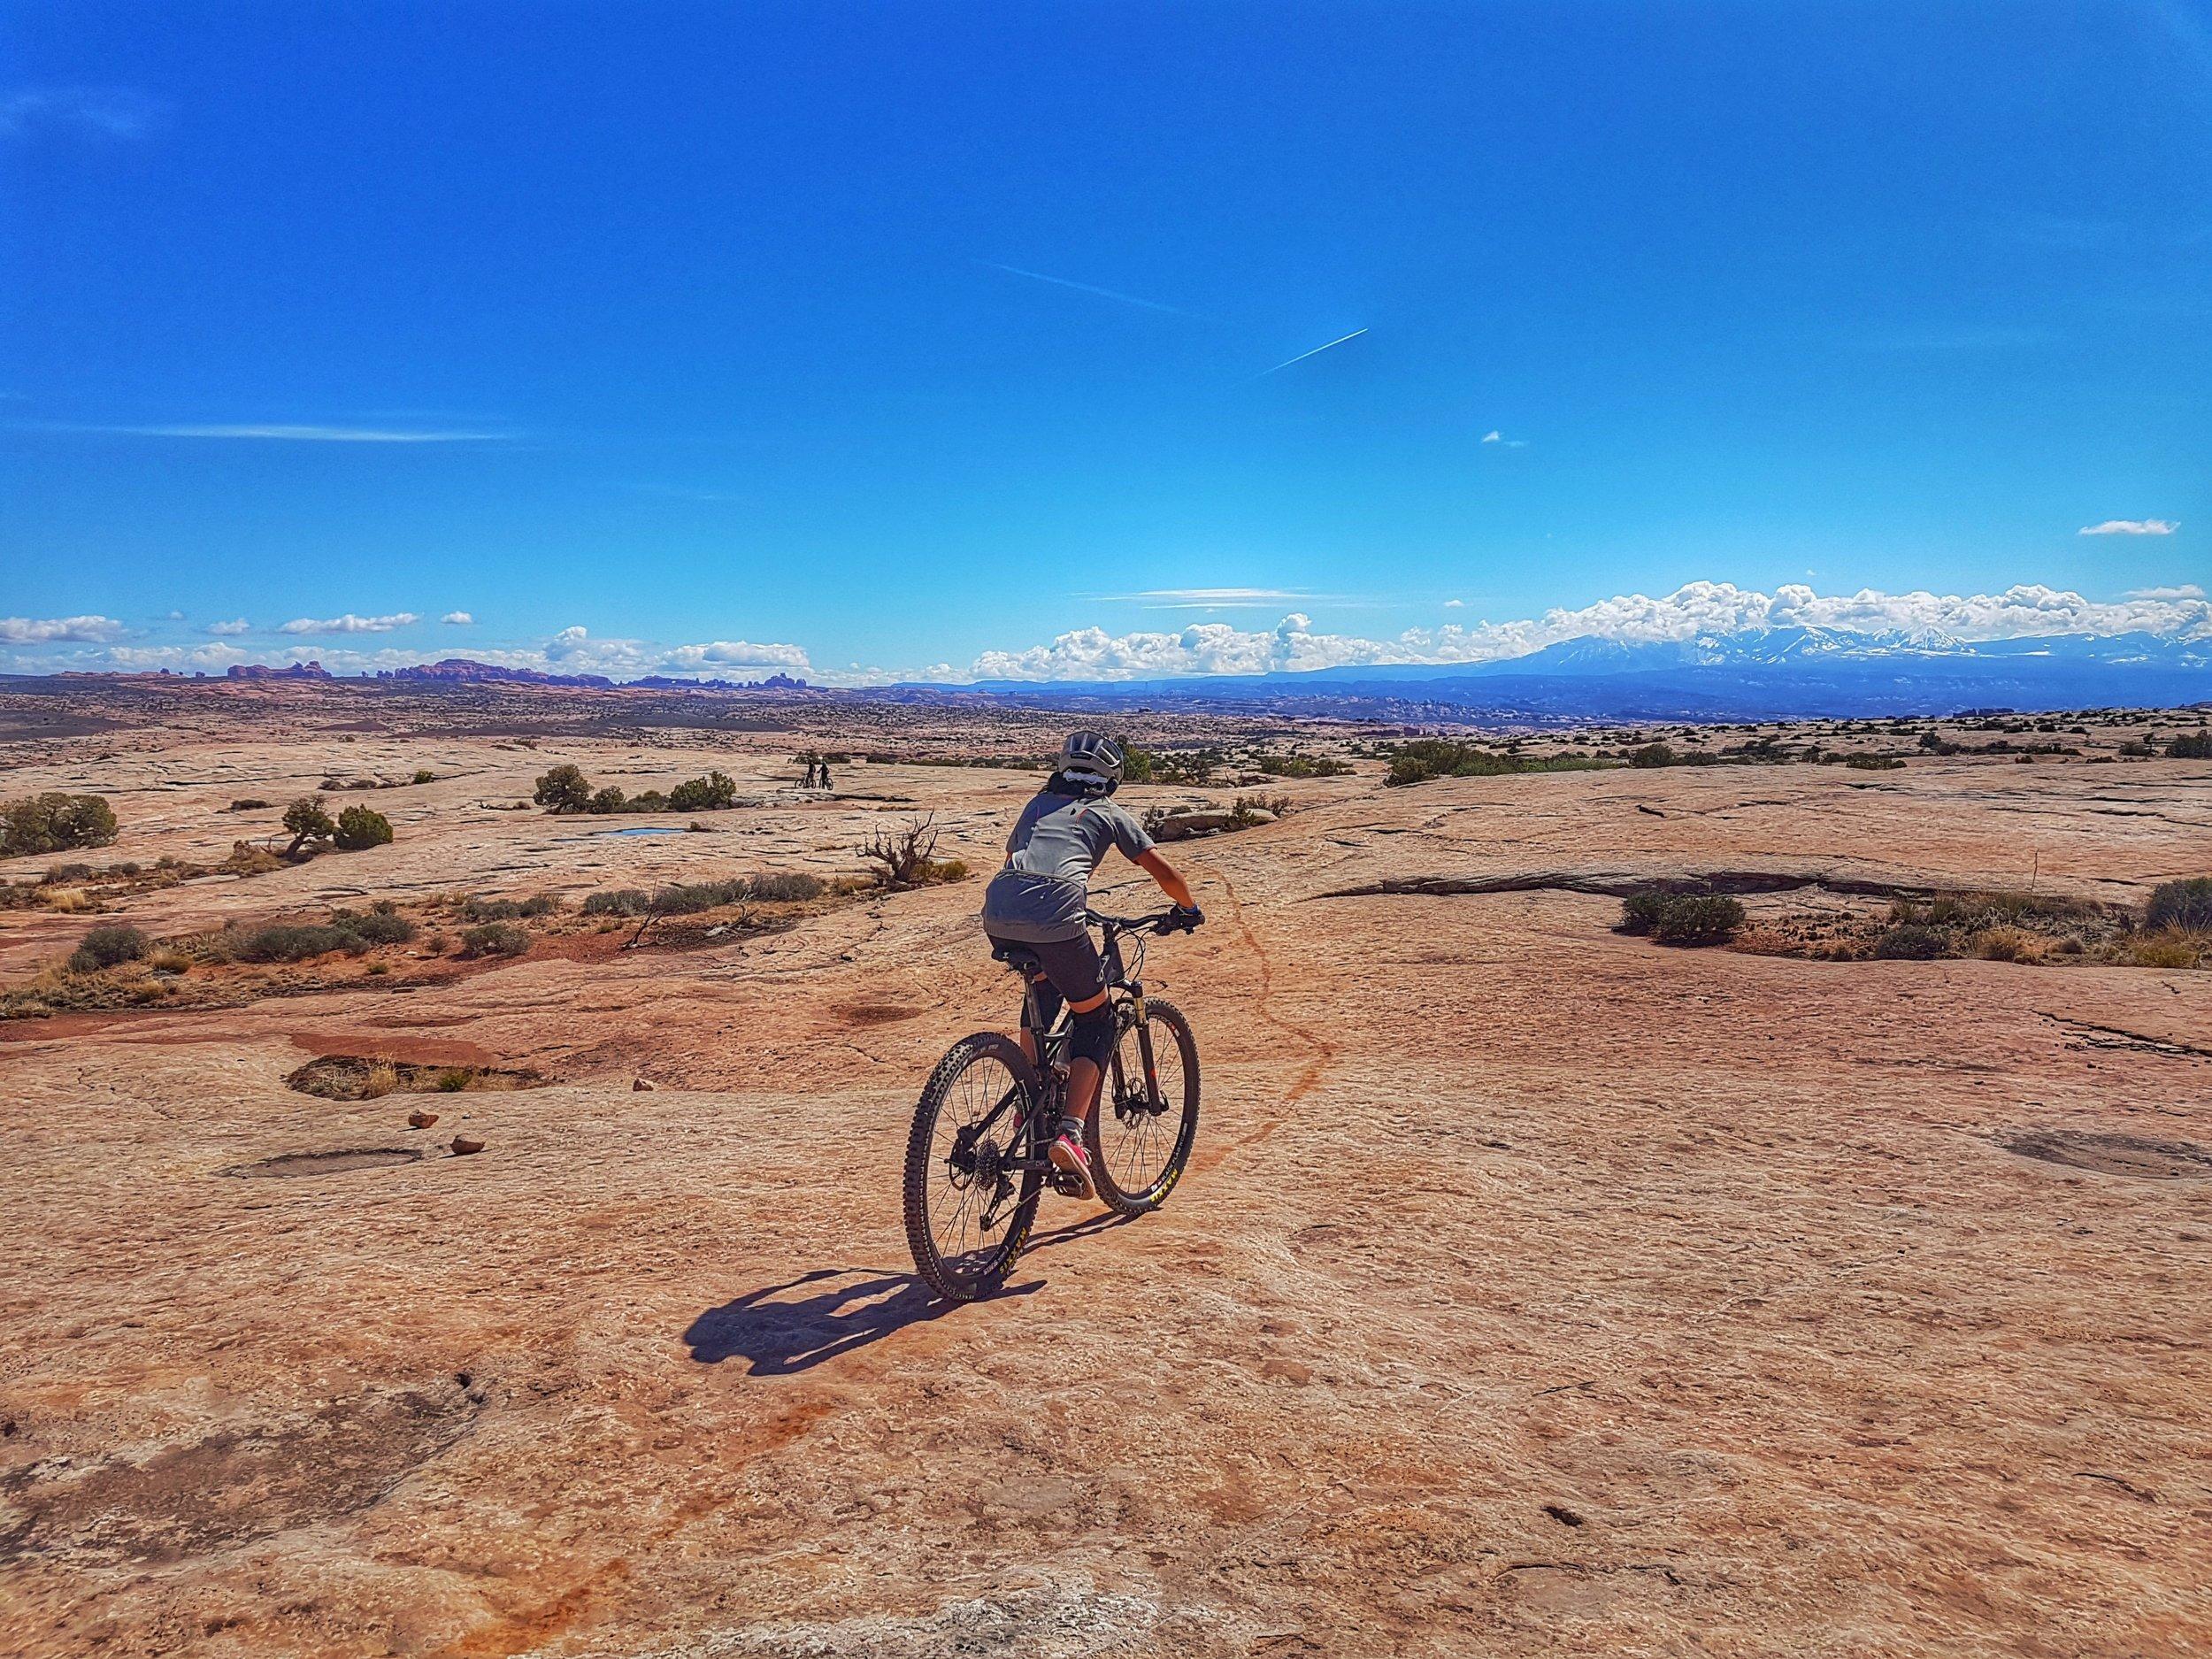 Circle-O trail, Moab Brand trail system.